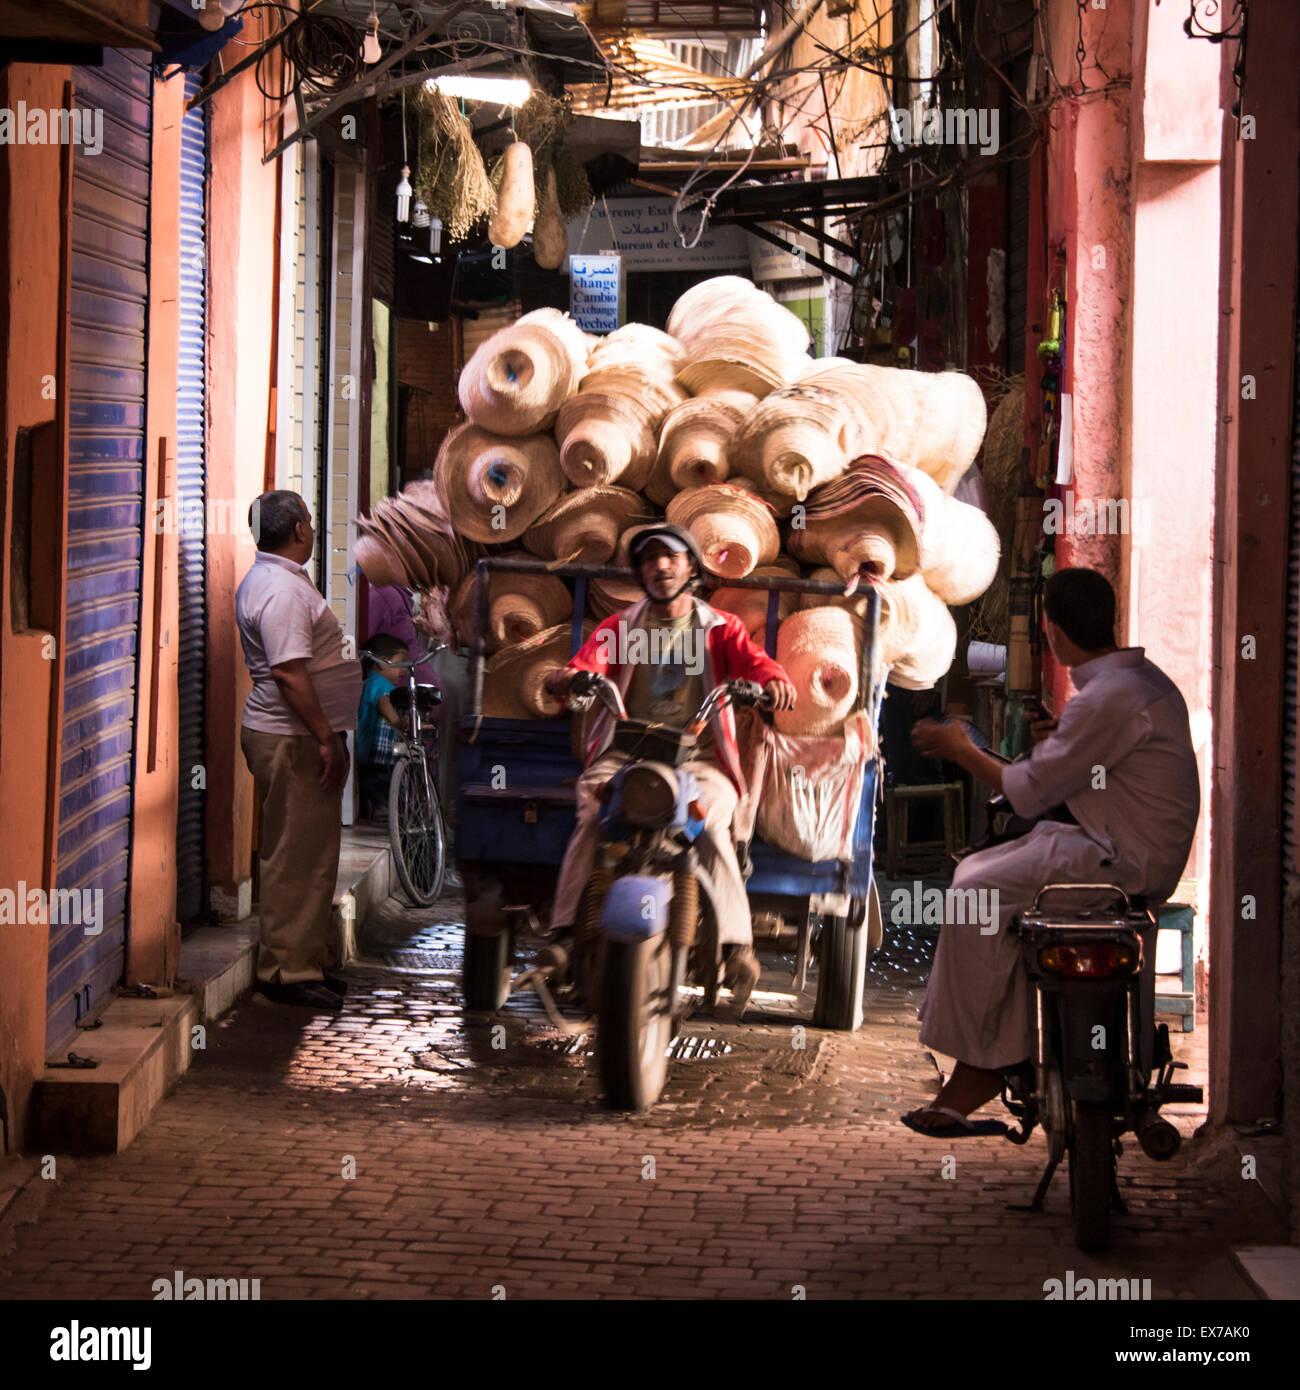 Un material de proveedores en un vehículo motorizado en Marrakech, Marruecos Imagen De Stock